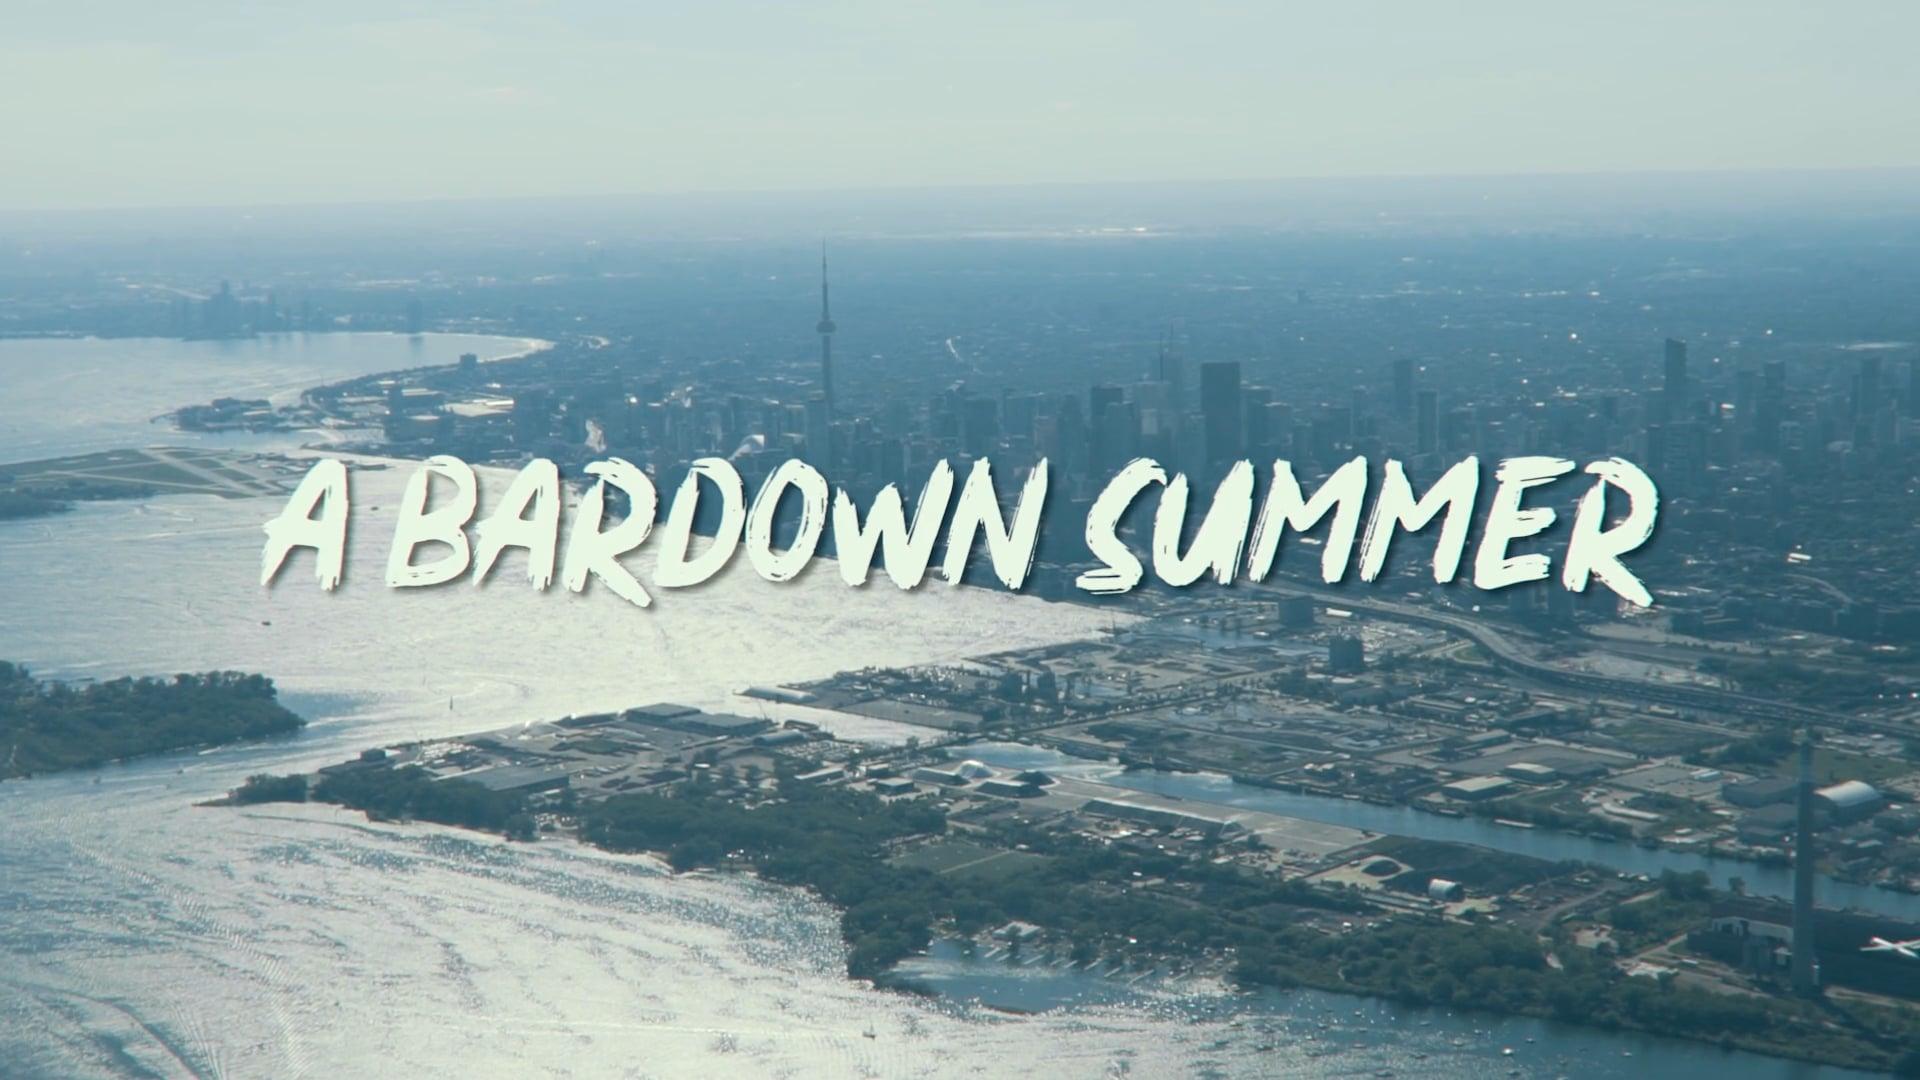 A BARDOWN SUMMER (Short Documentary)